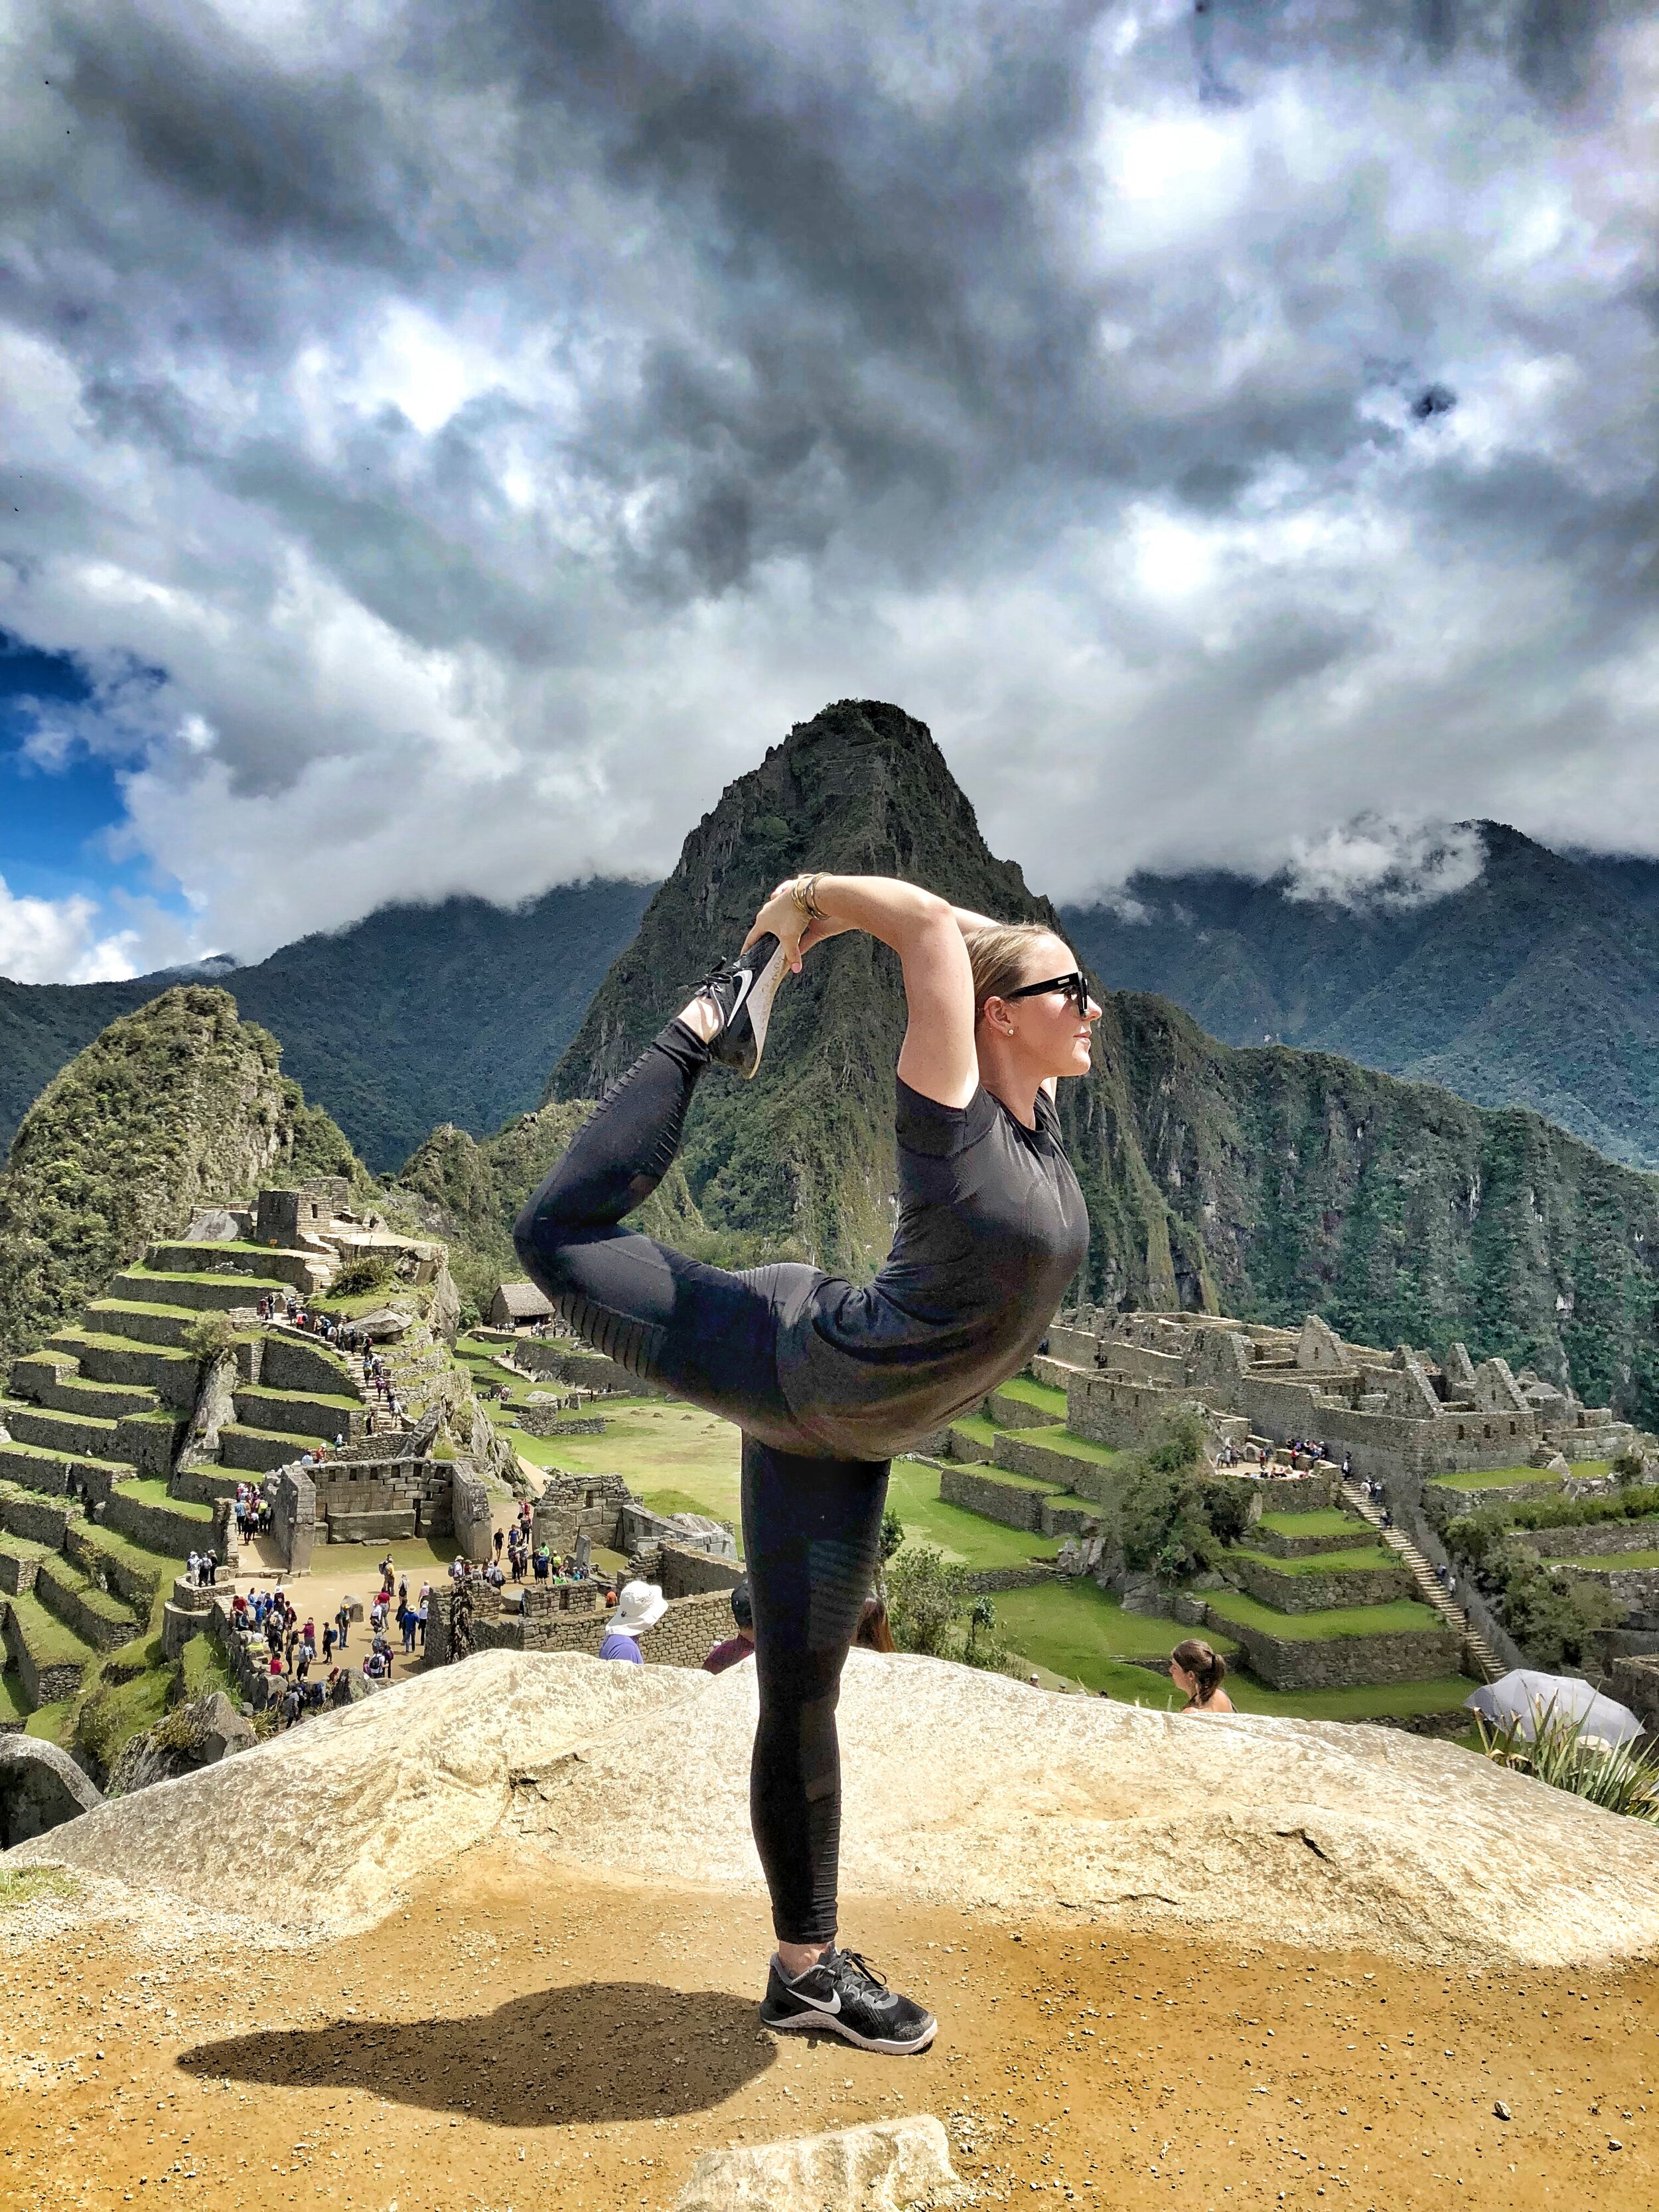 Yoga @ Machu Picchu: had to do it!